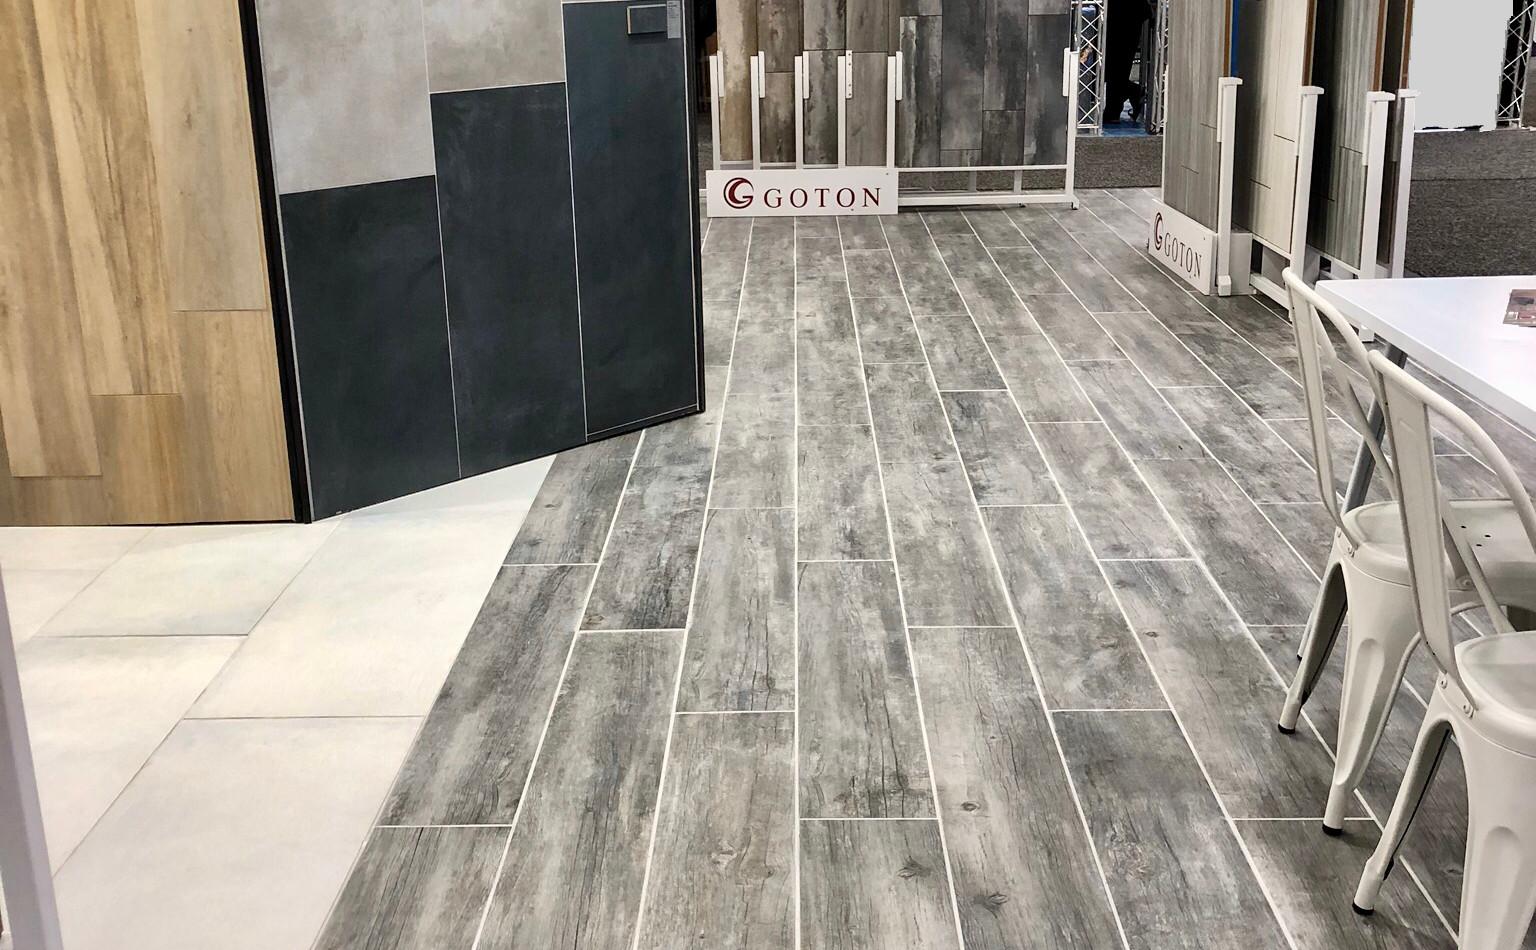 Vintage installed on the floor